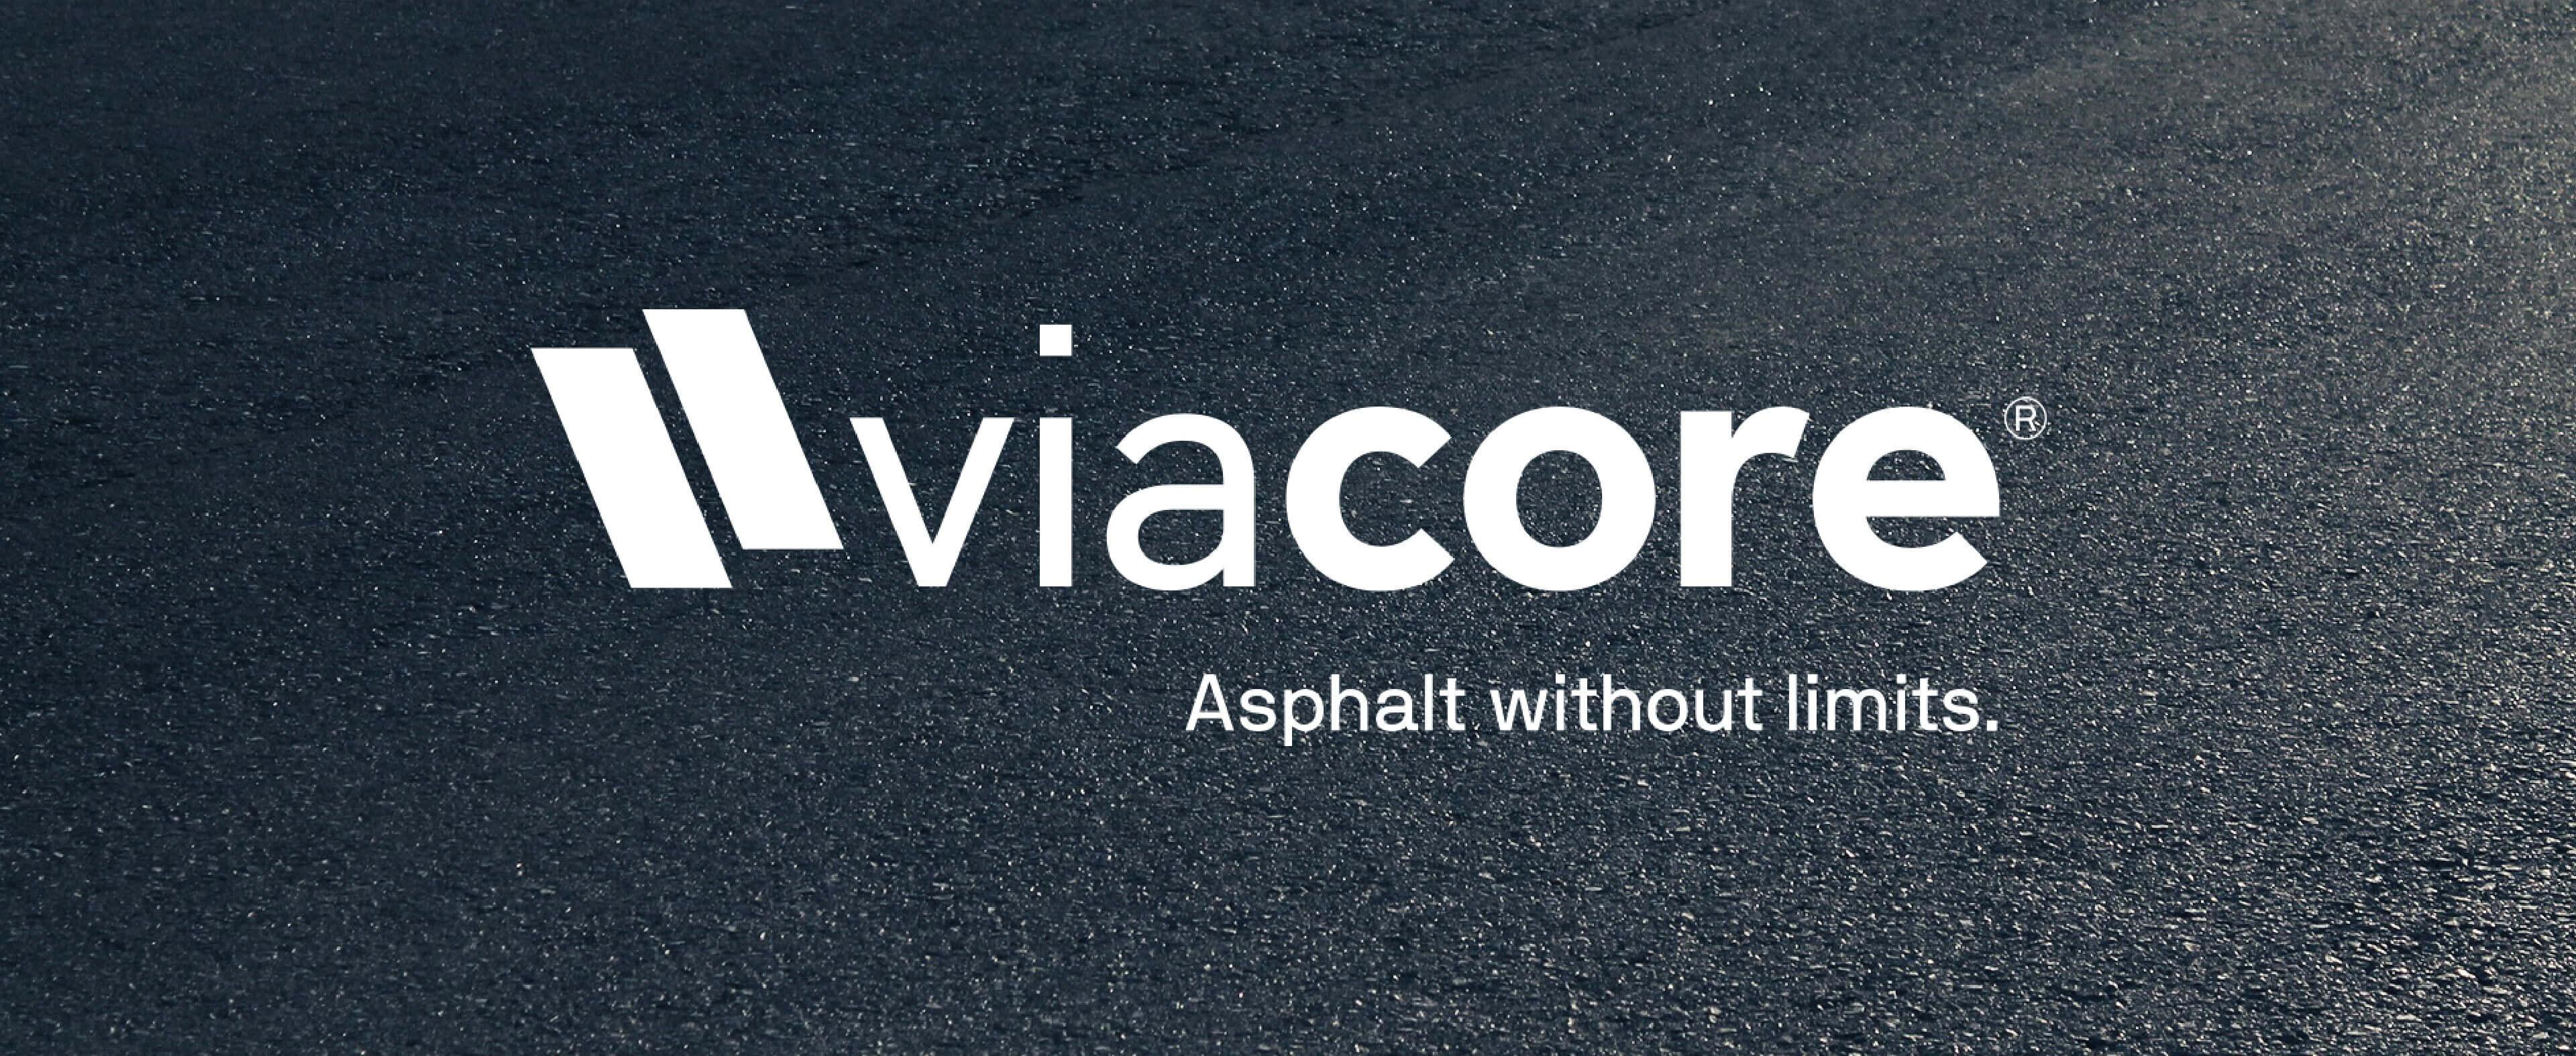 Q2 Werbeagentur, Vialit, Viacore, Naming, Claim, Logo